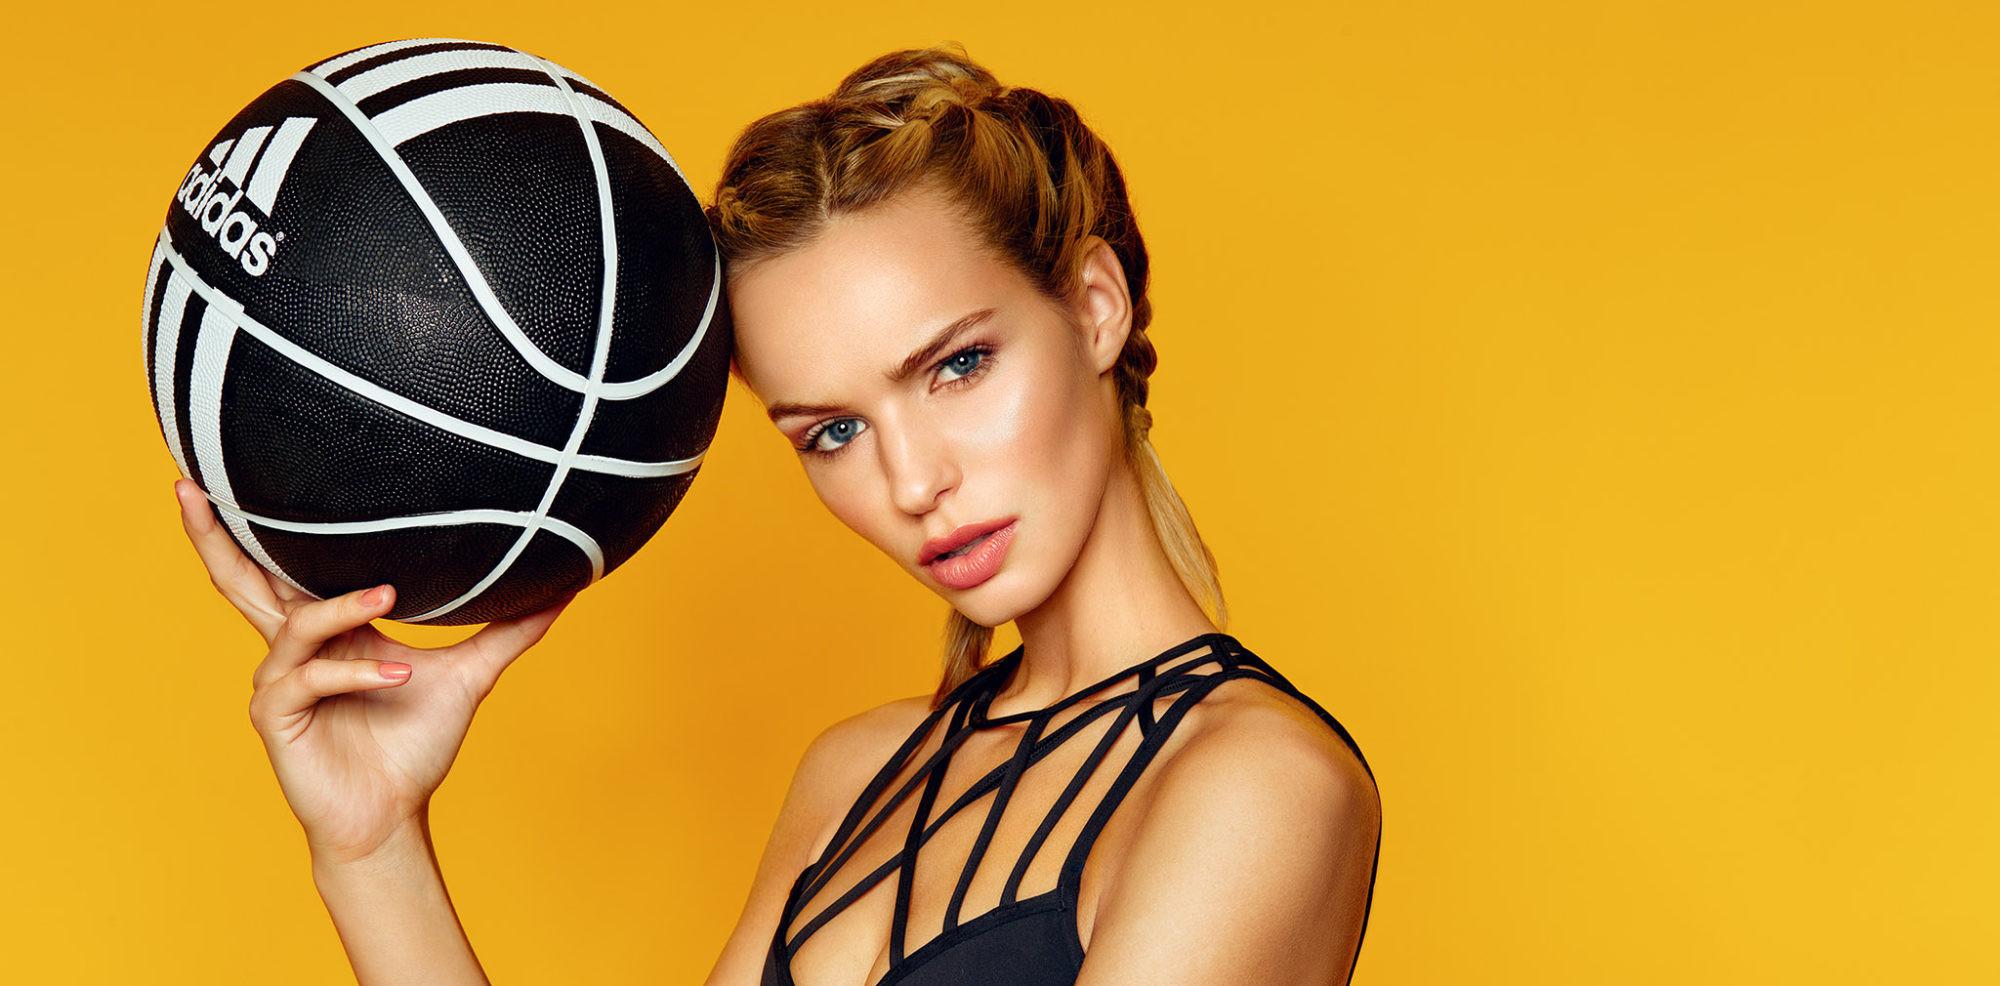 Boutique Retouching cropped-Annelie-sport-fashion-portrait-retouching-2 Blog / Learn